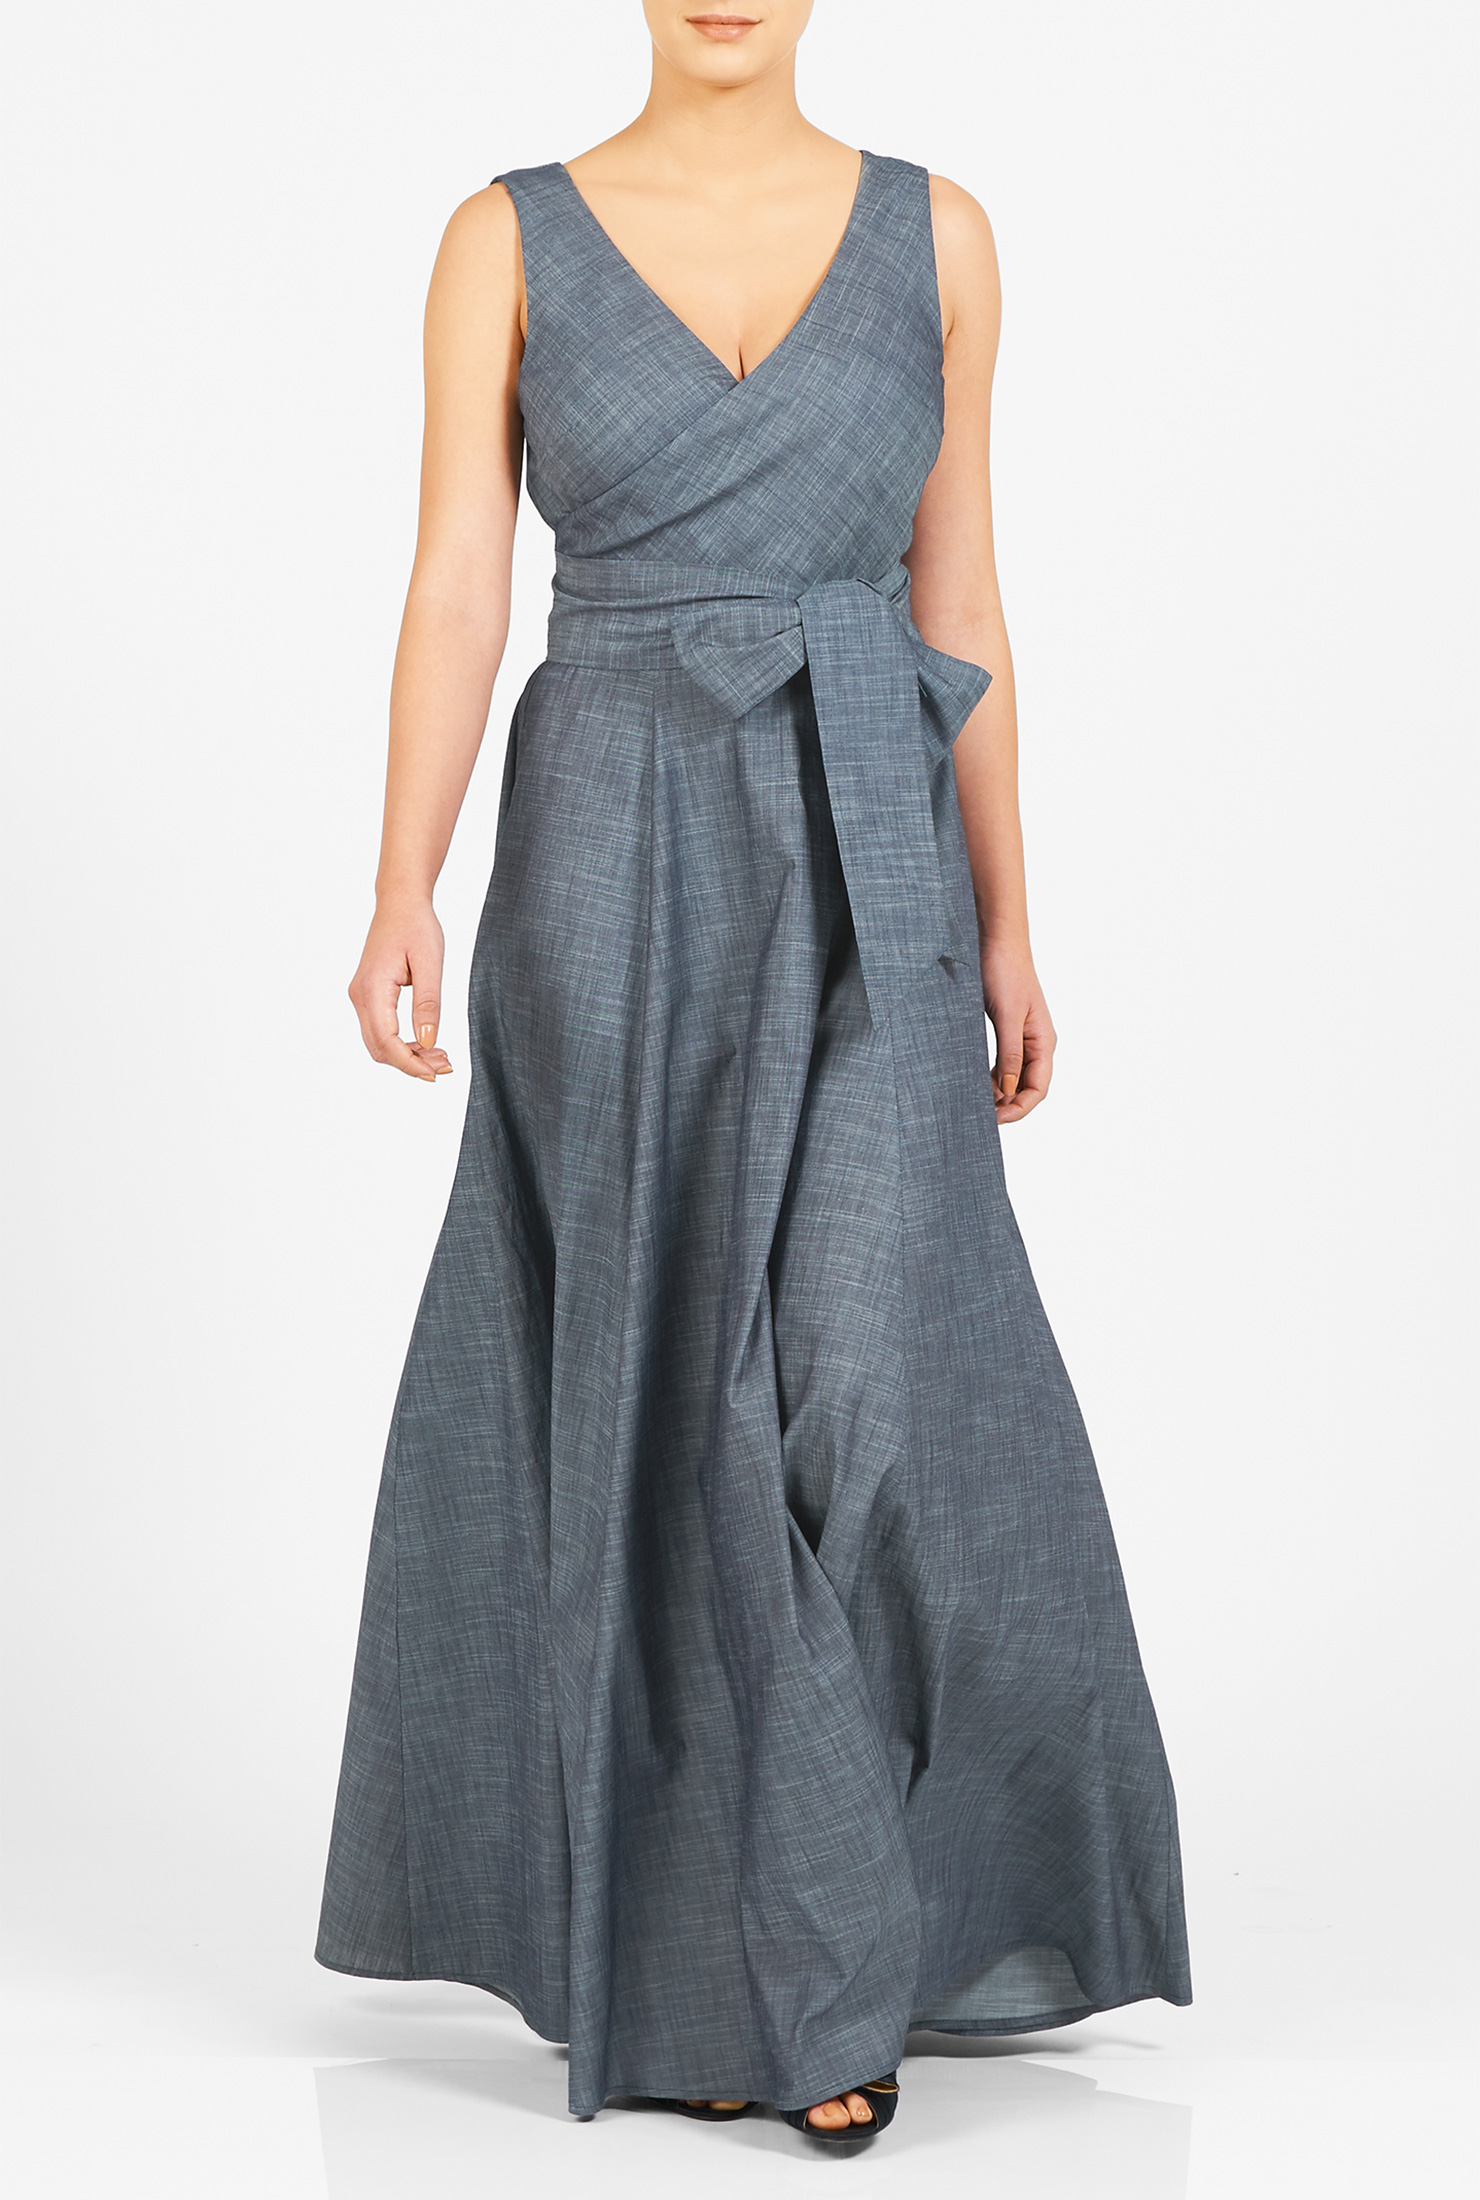 blue dresses, chambray dresses, chambray maxi dresses, cotton dresses, full  length IXWIAFR